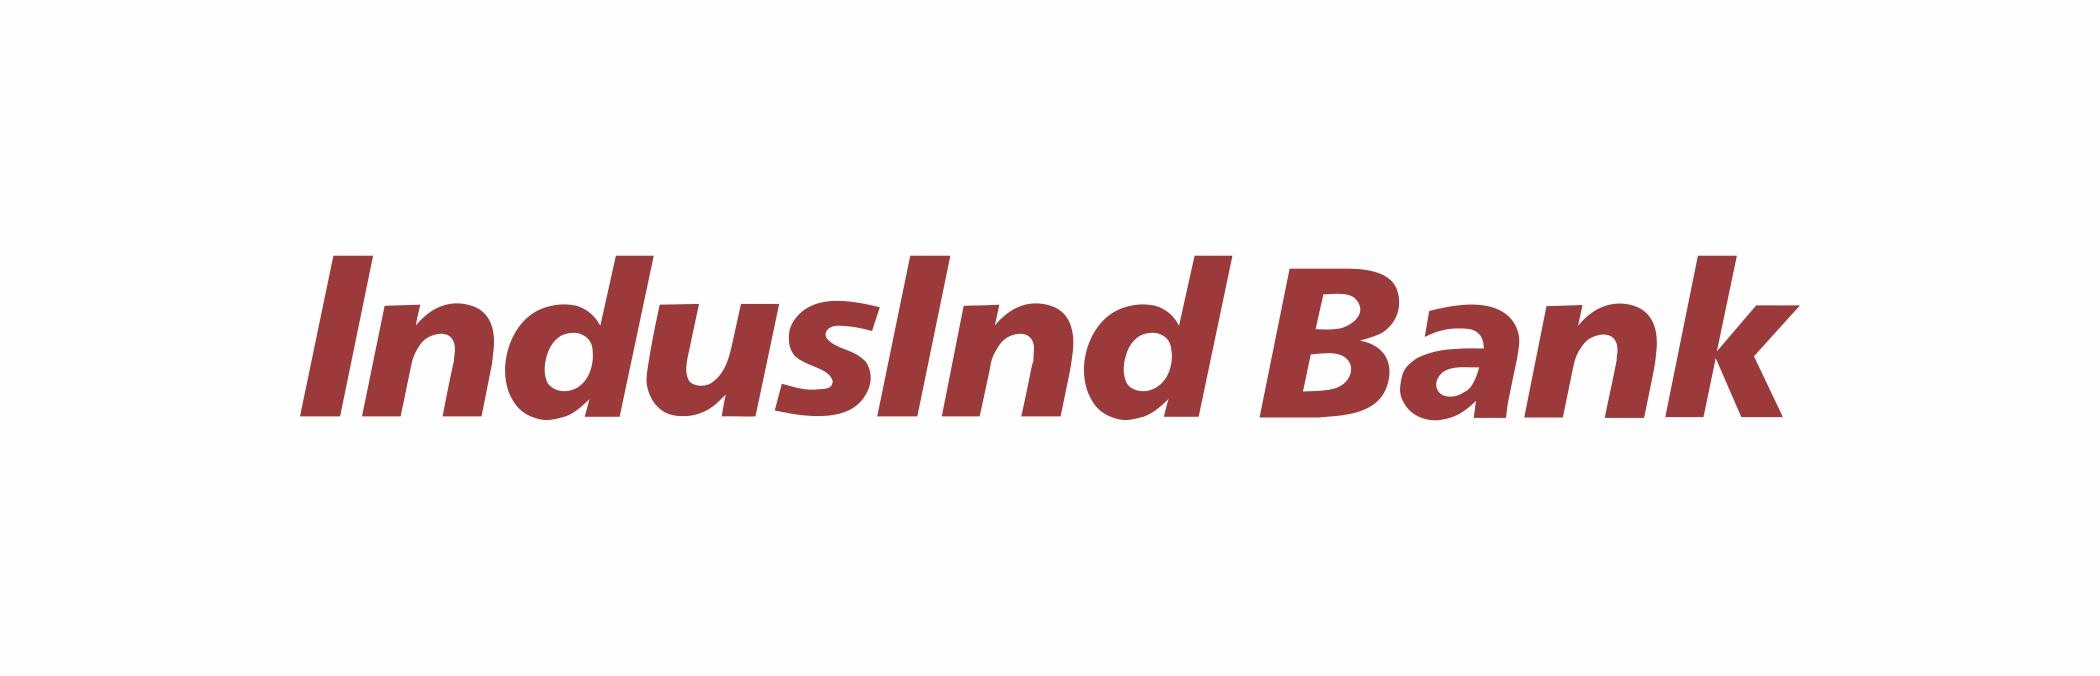 IndusInd Bank, Aundh Pune